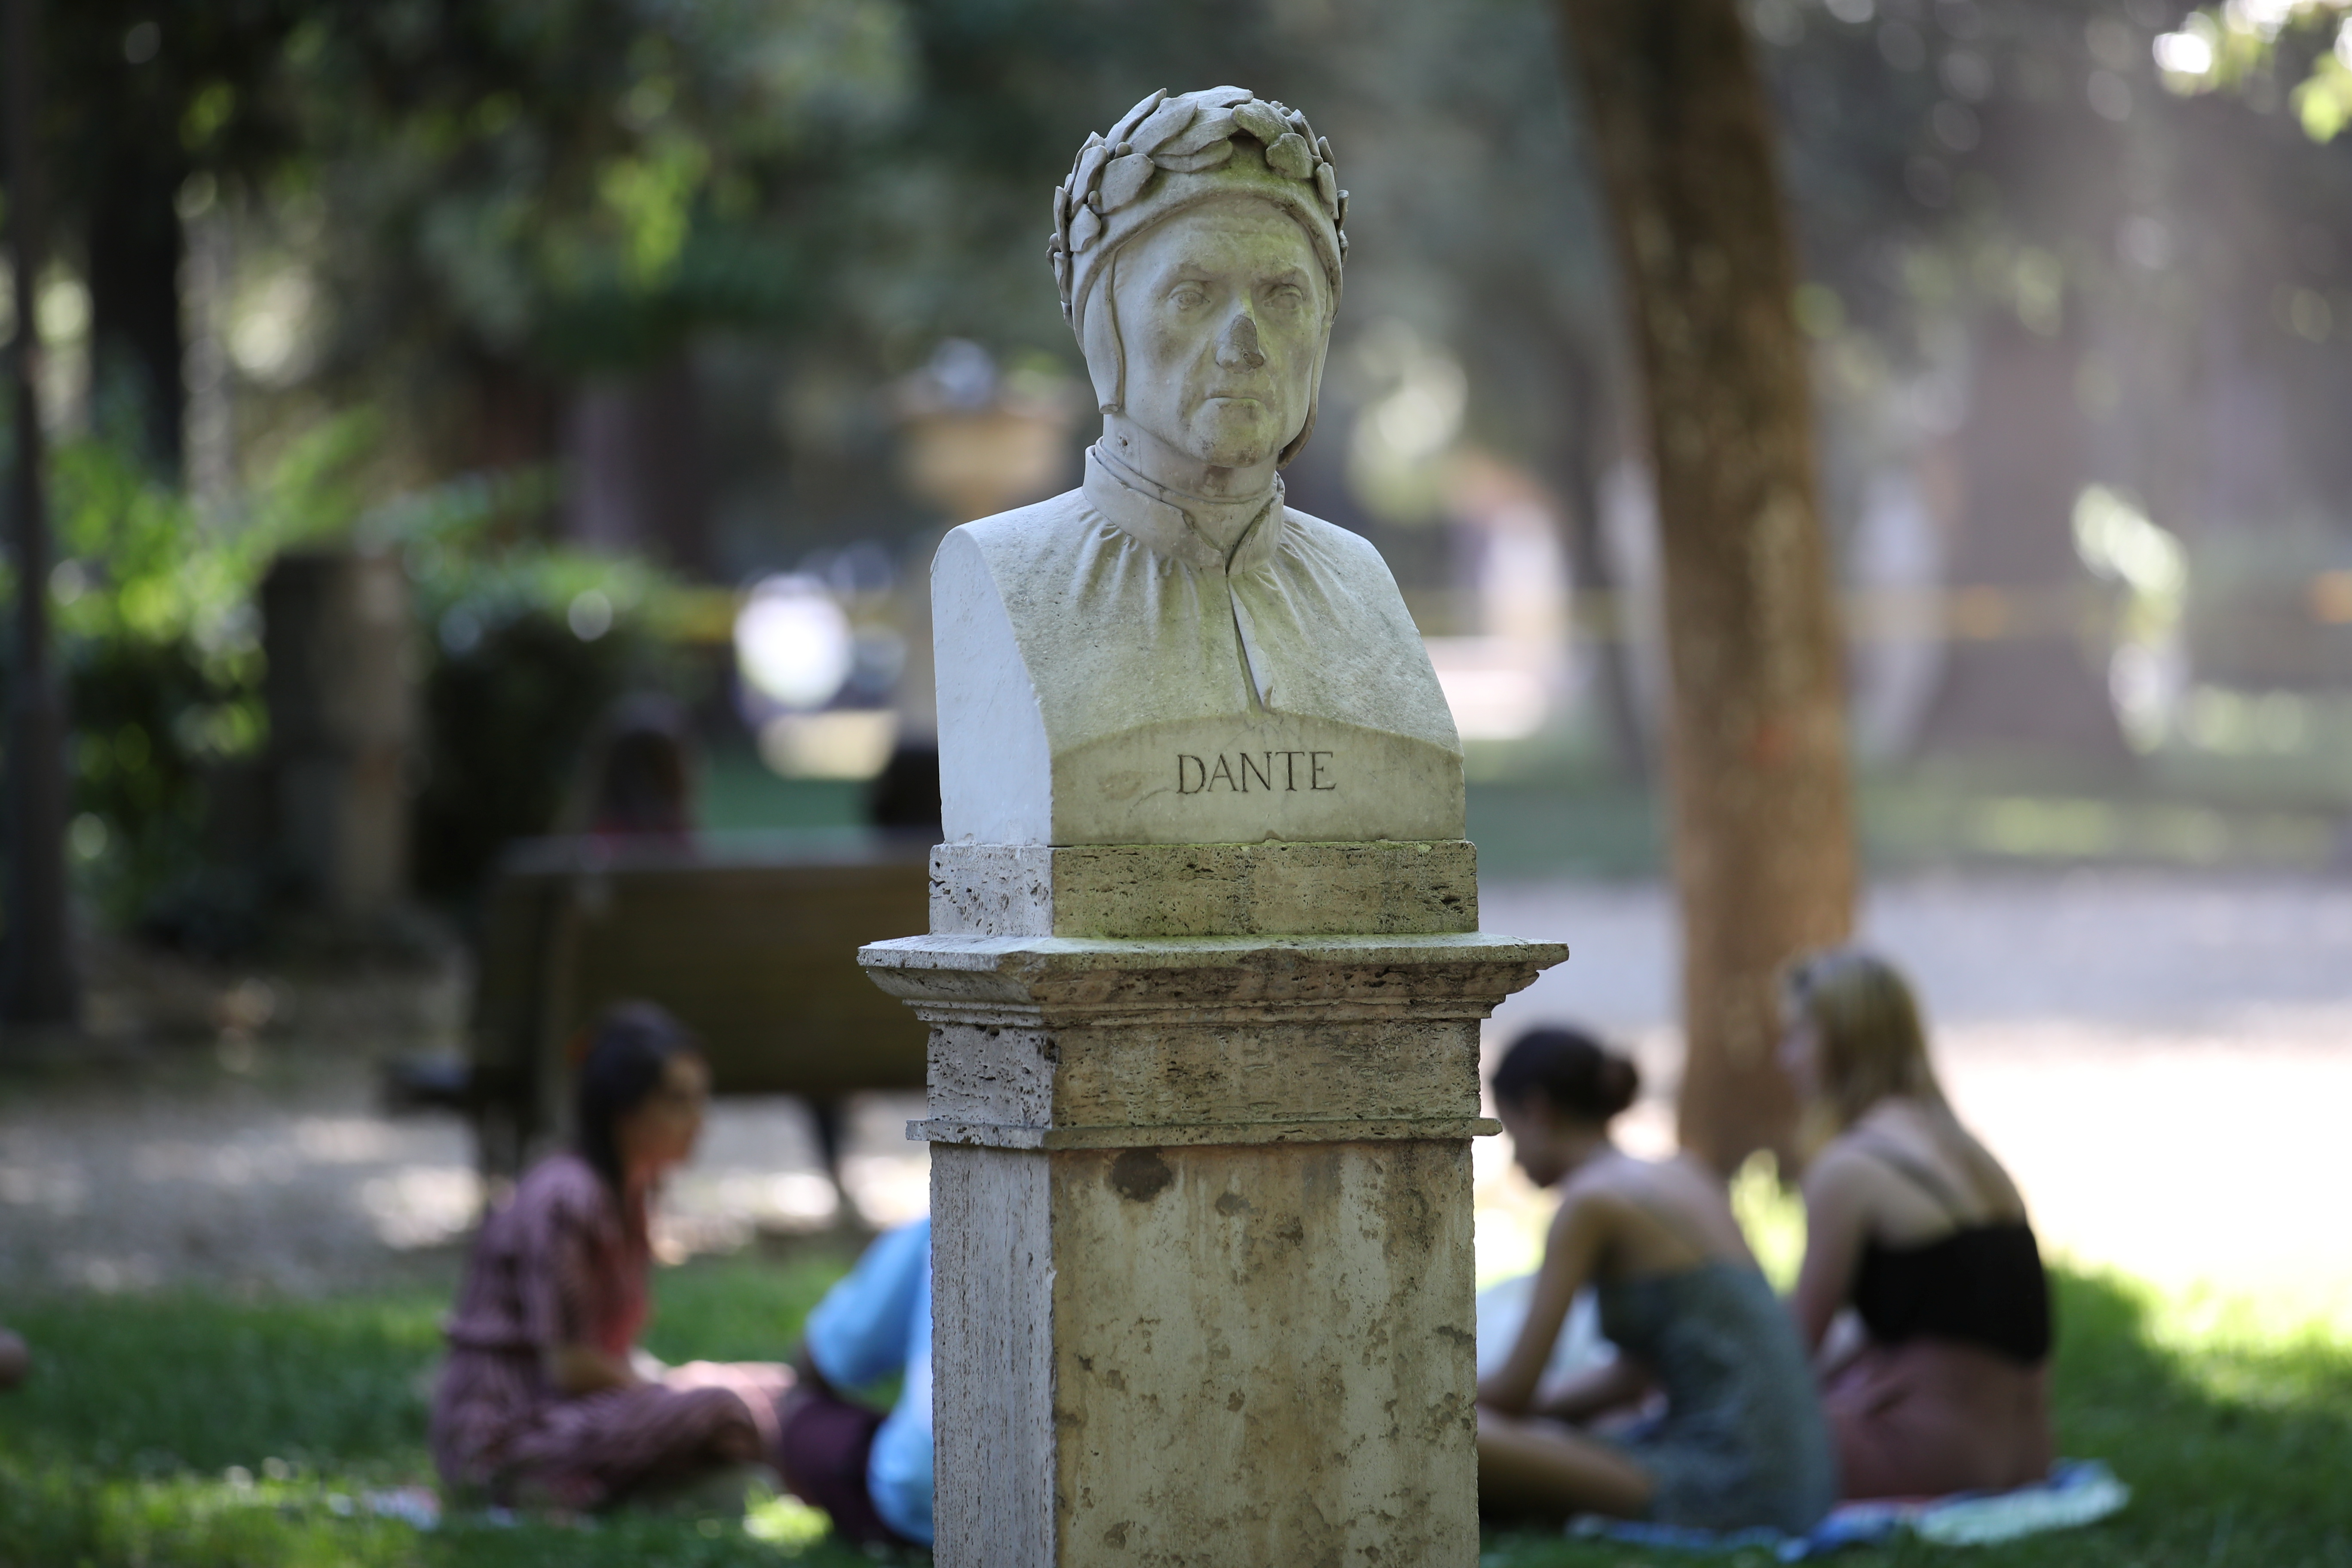 The bust of Italian poet Dante Alighieri is seen at Villa Borghese park, in Rome, Italy June 1, 2021. Picture taken June 1, 2021. REUTERS/Yara Nardi